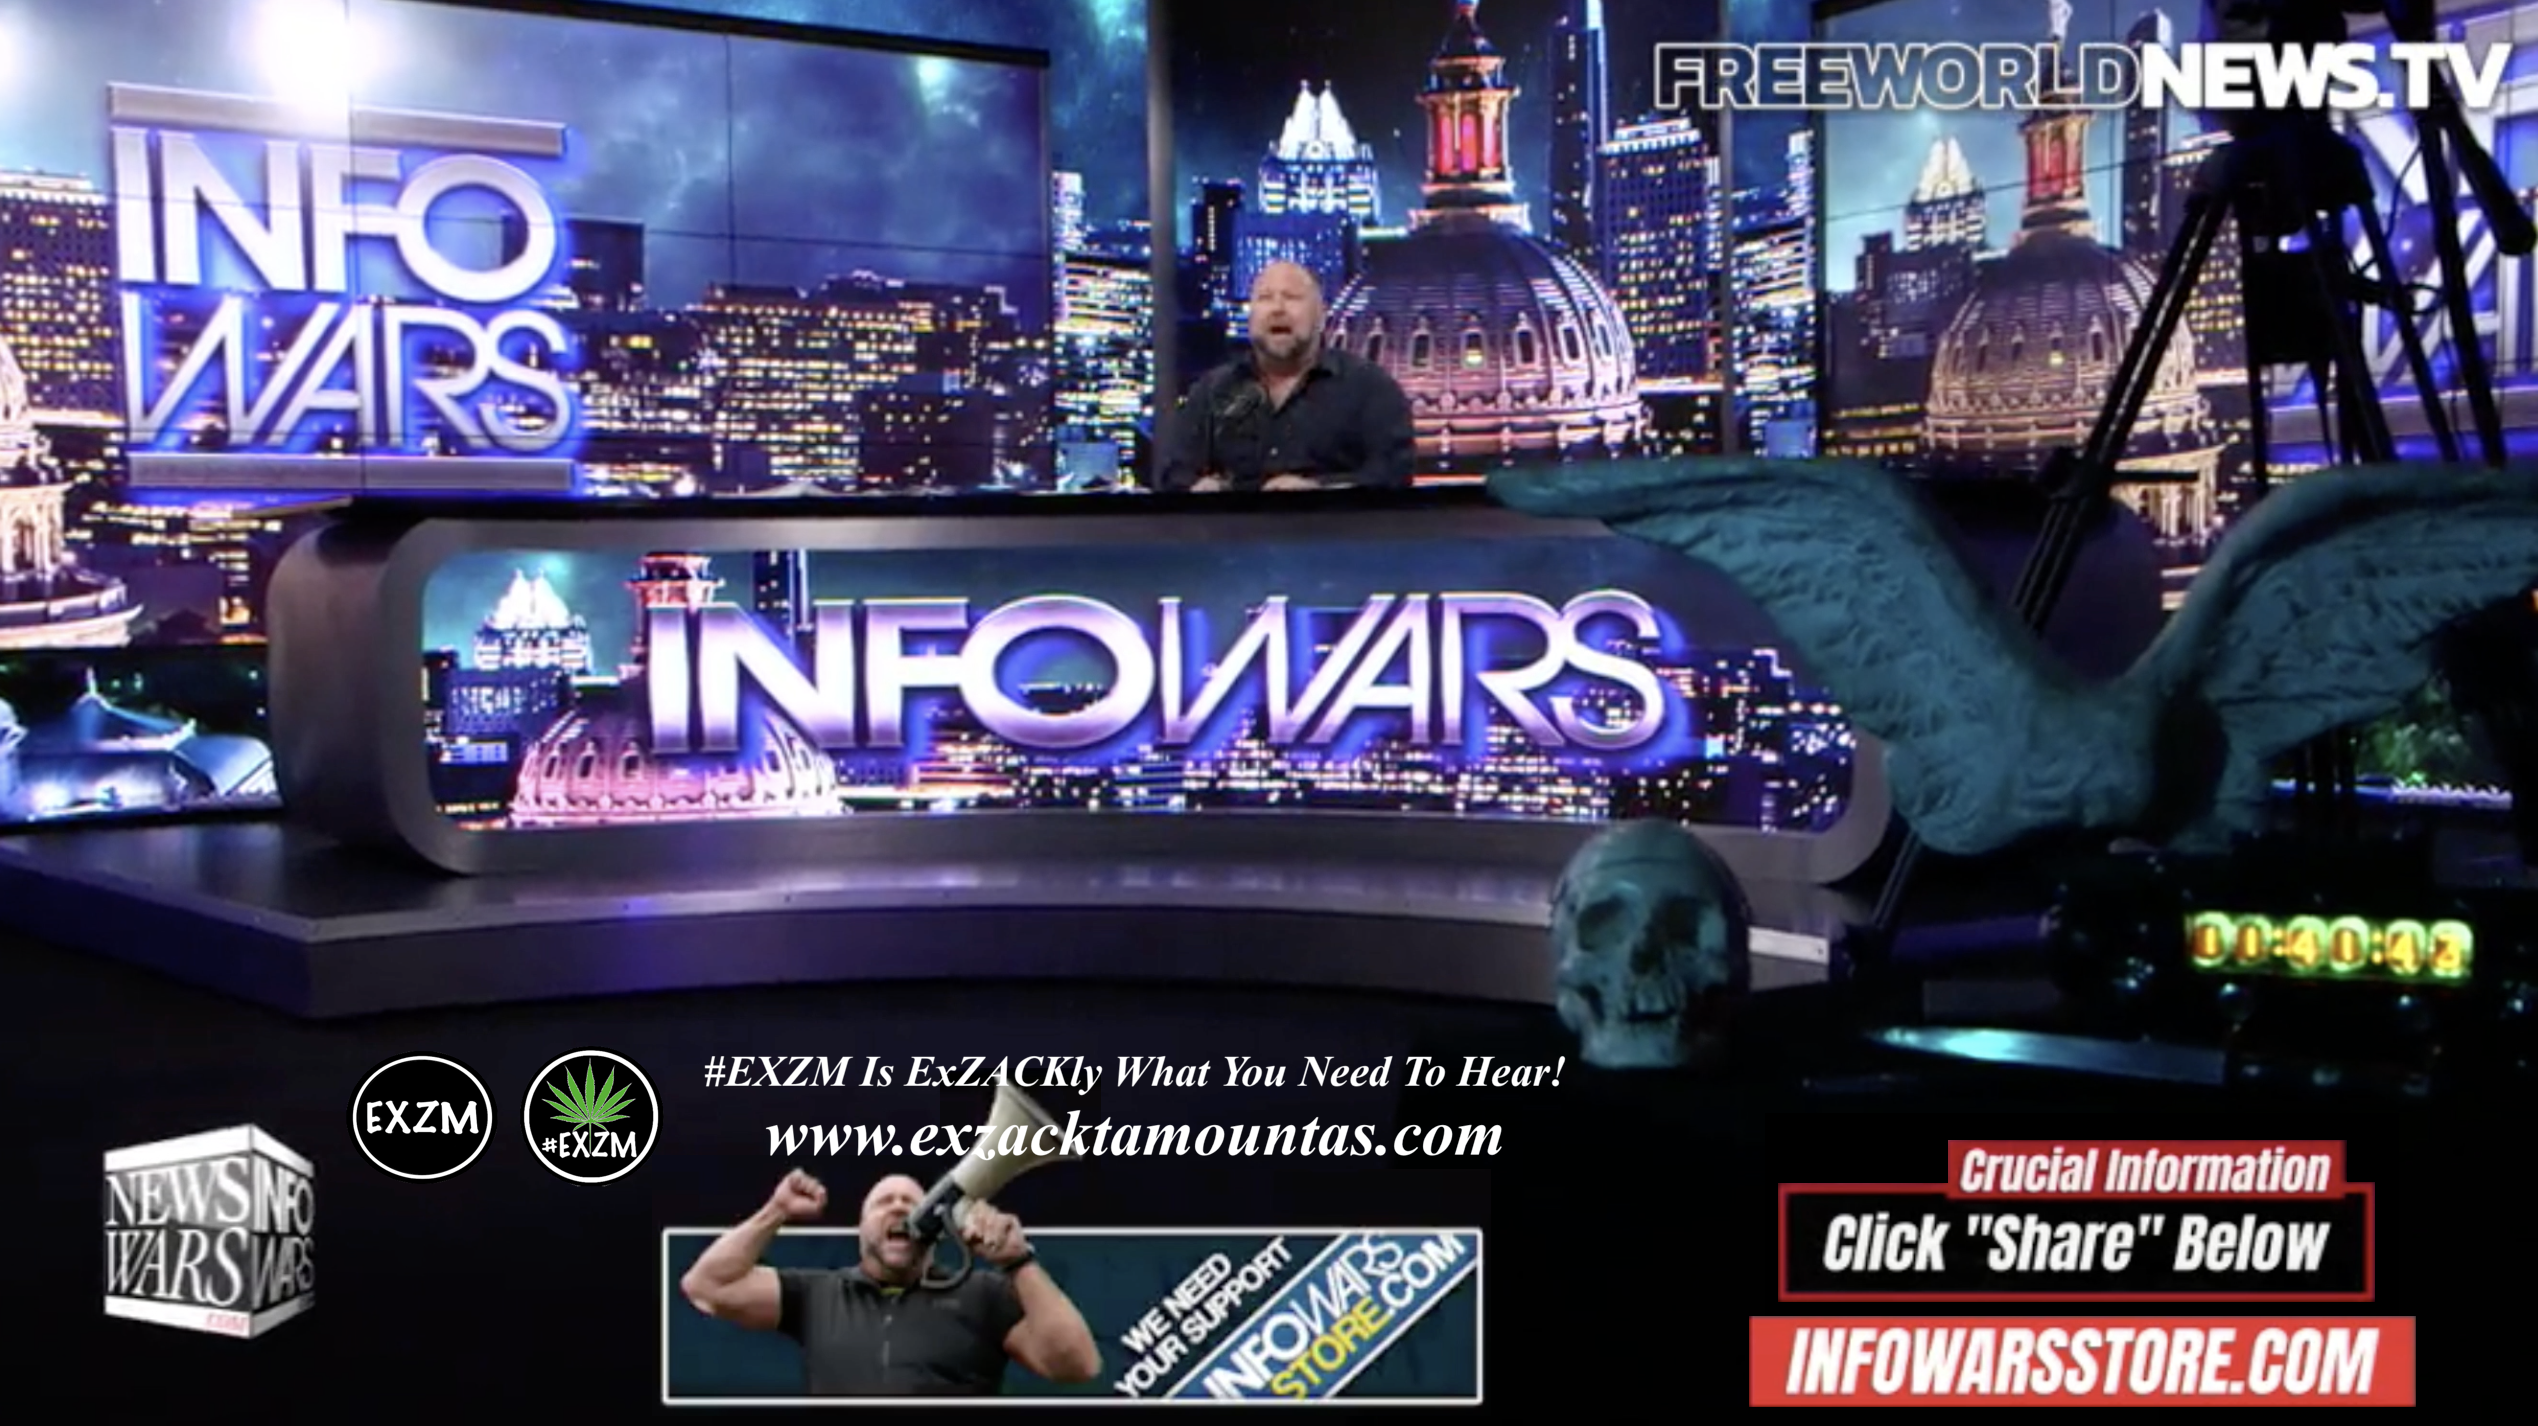 Alex Jones Live In Infowars Studio Human Skull Angel Wings Dagger Free World News TV EXZM Zack Mount September 14th 2021 copy